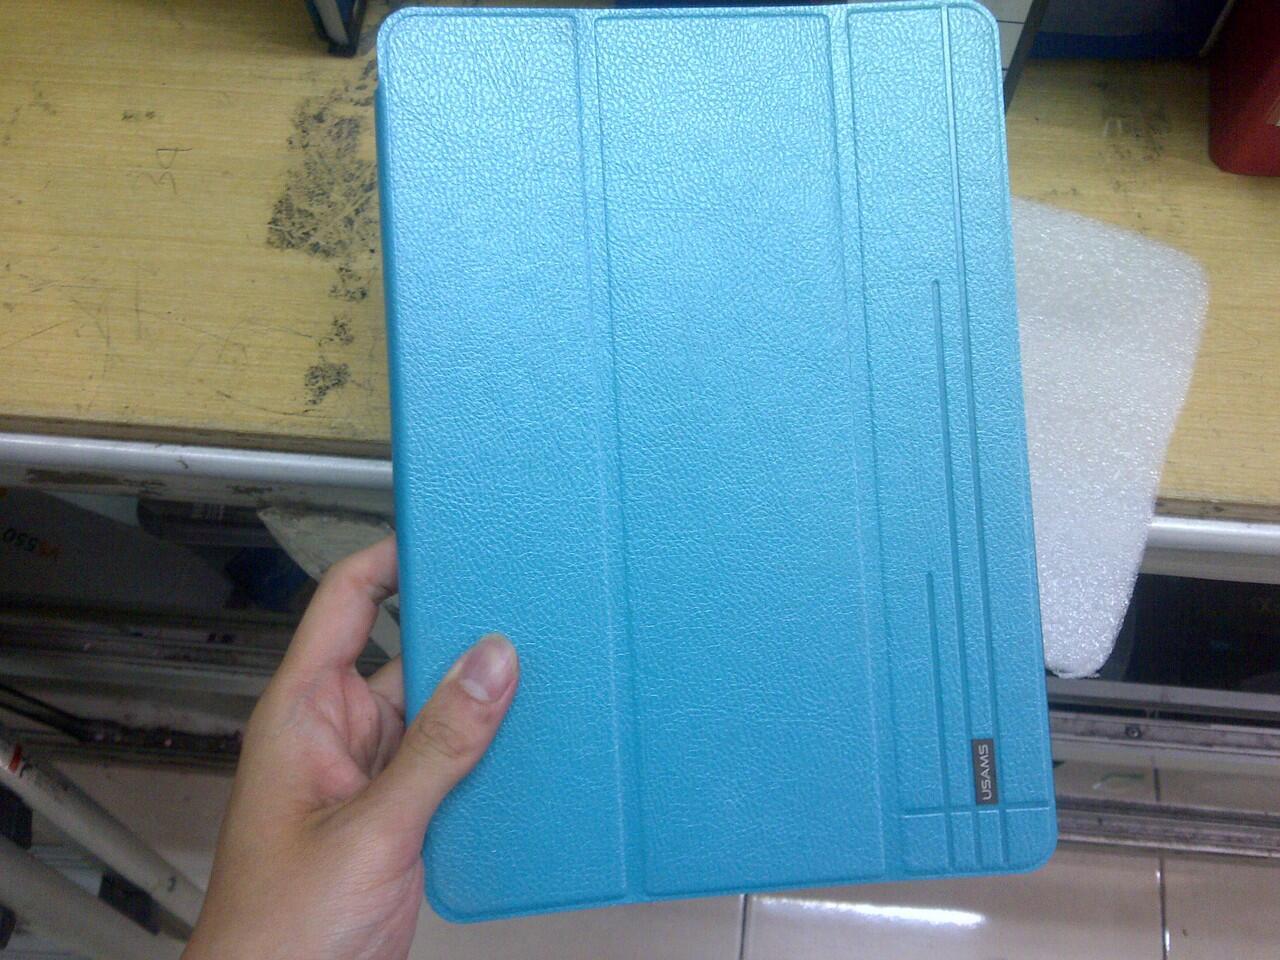 HARDSOFTCASE SMART BOOKCOVER CASING SAMSUNG NOTE10.1 2014ANTIGORES SCREEN PROTEC P600